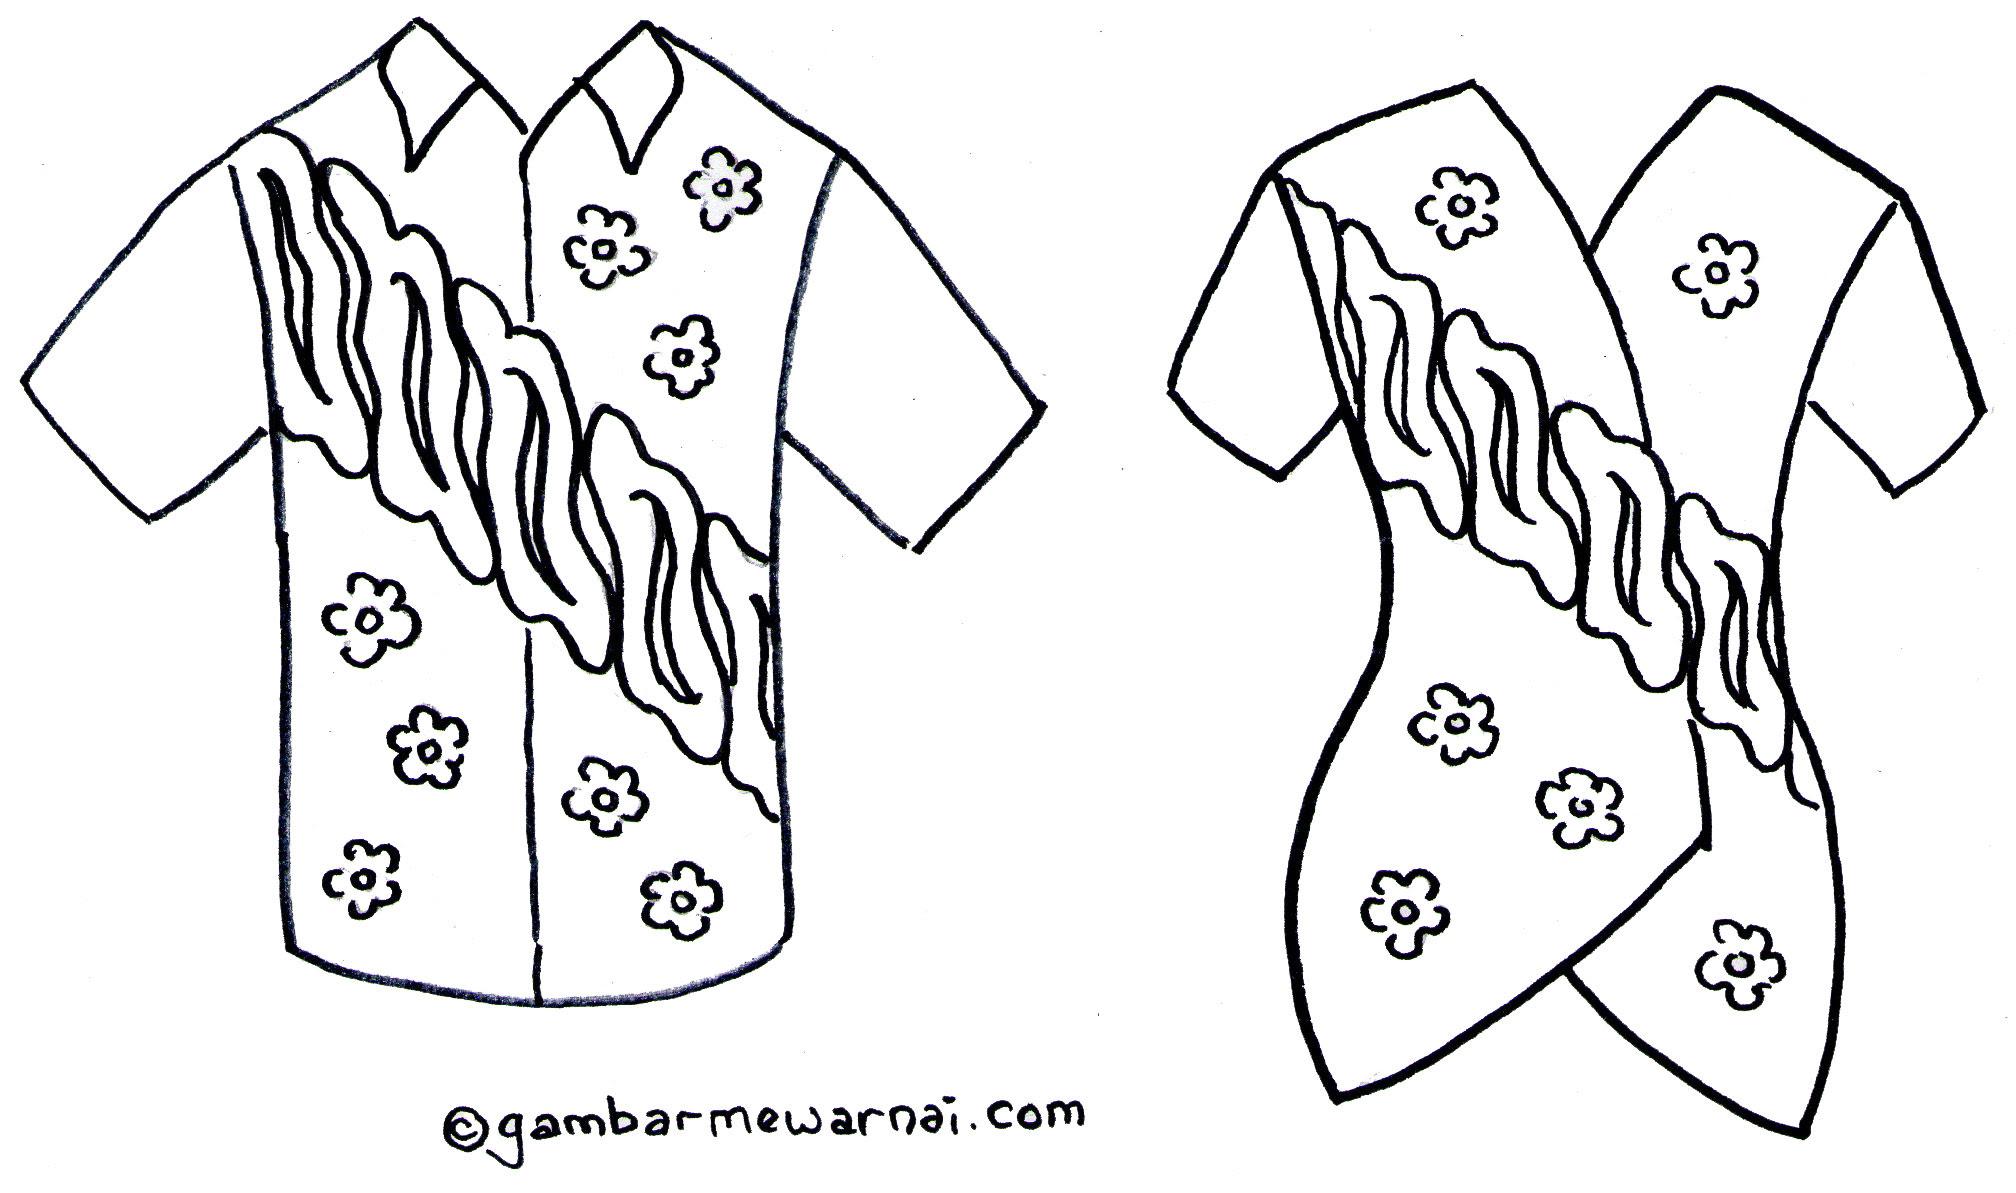 Gambar Mewarnai Baju Batik Gambar Mewarnai Mewarnai